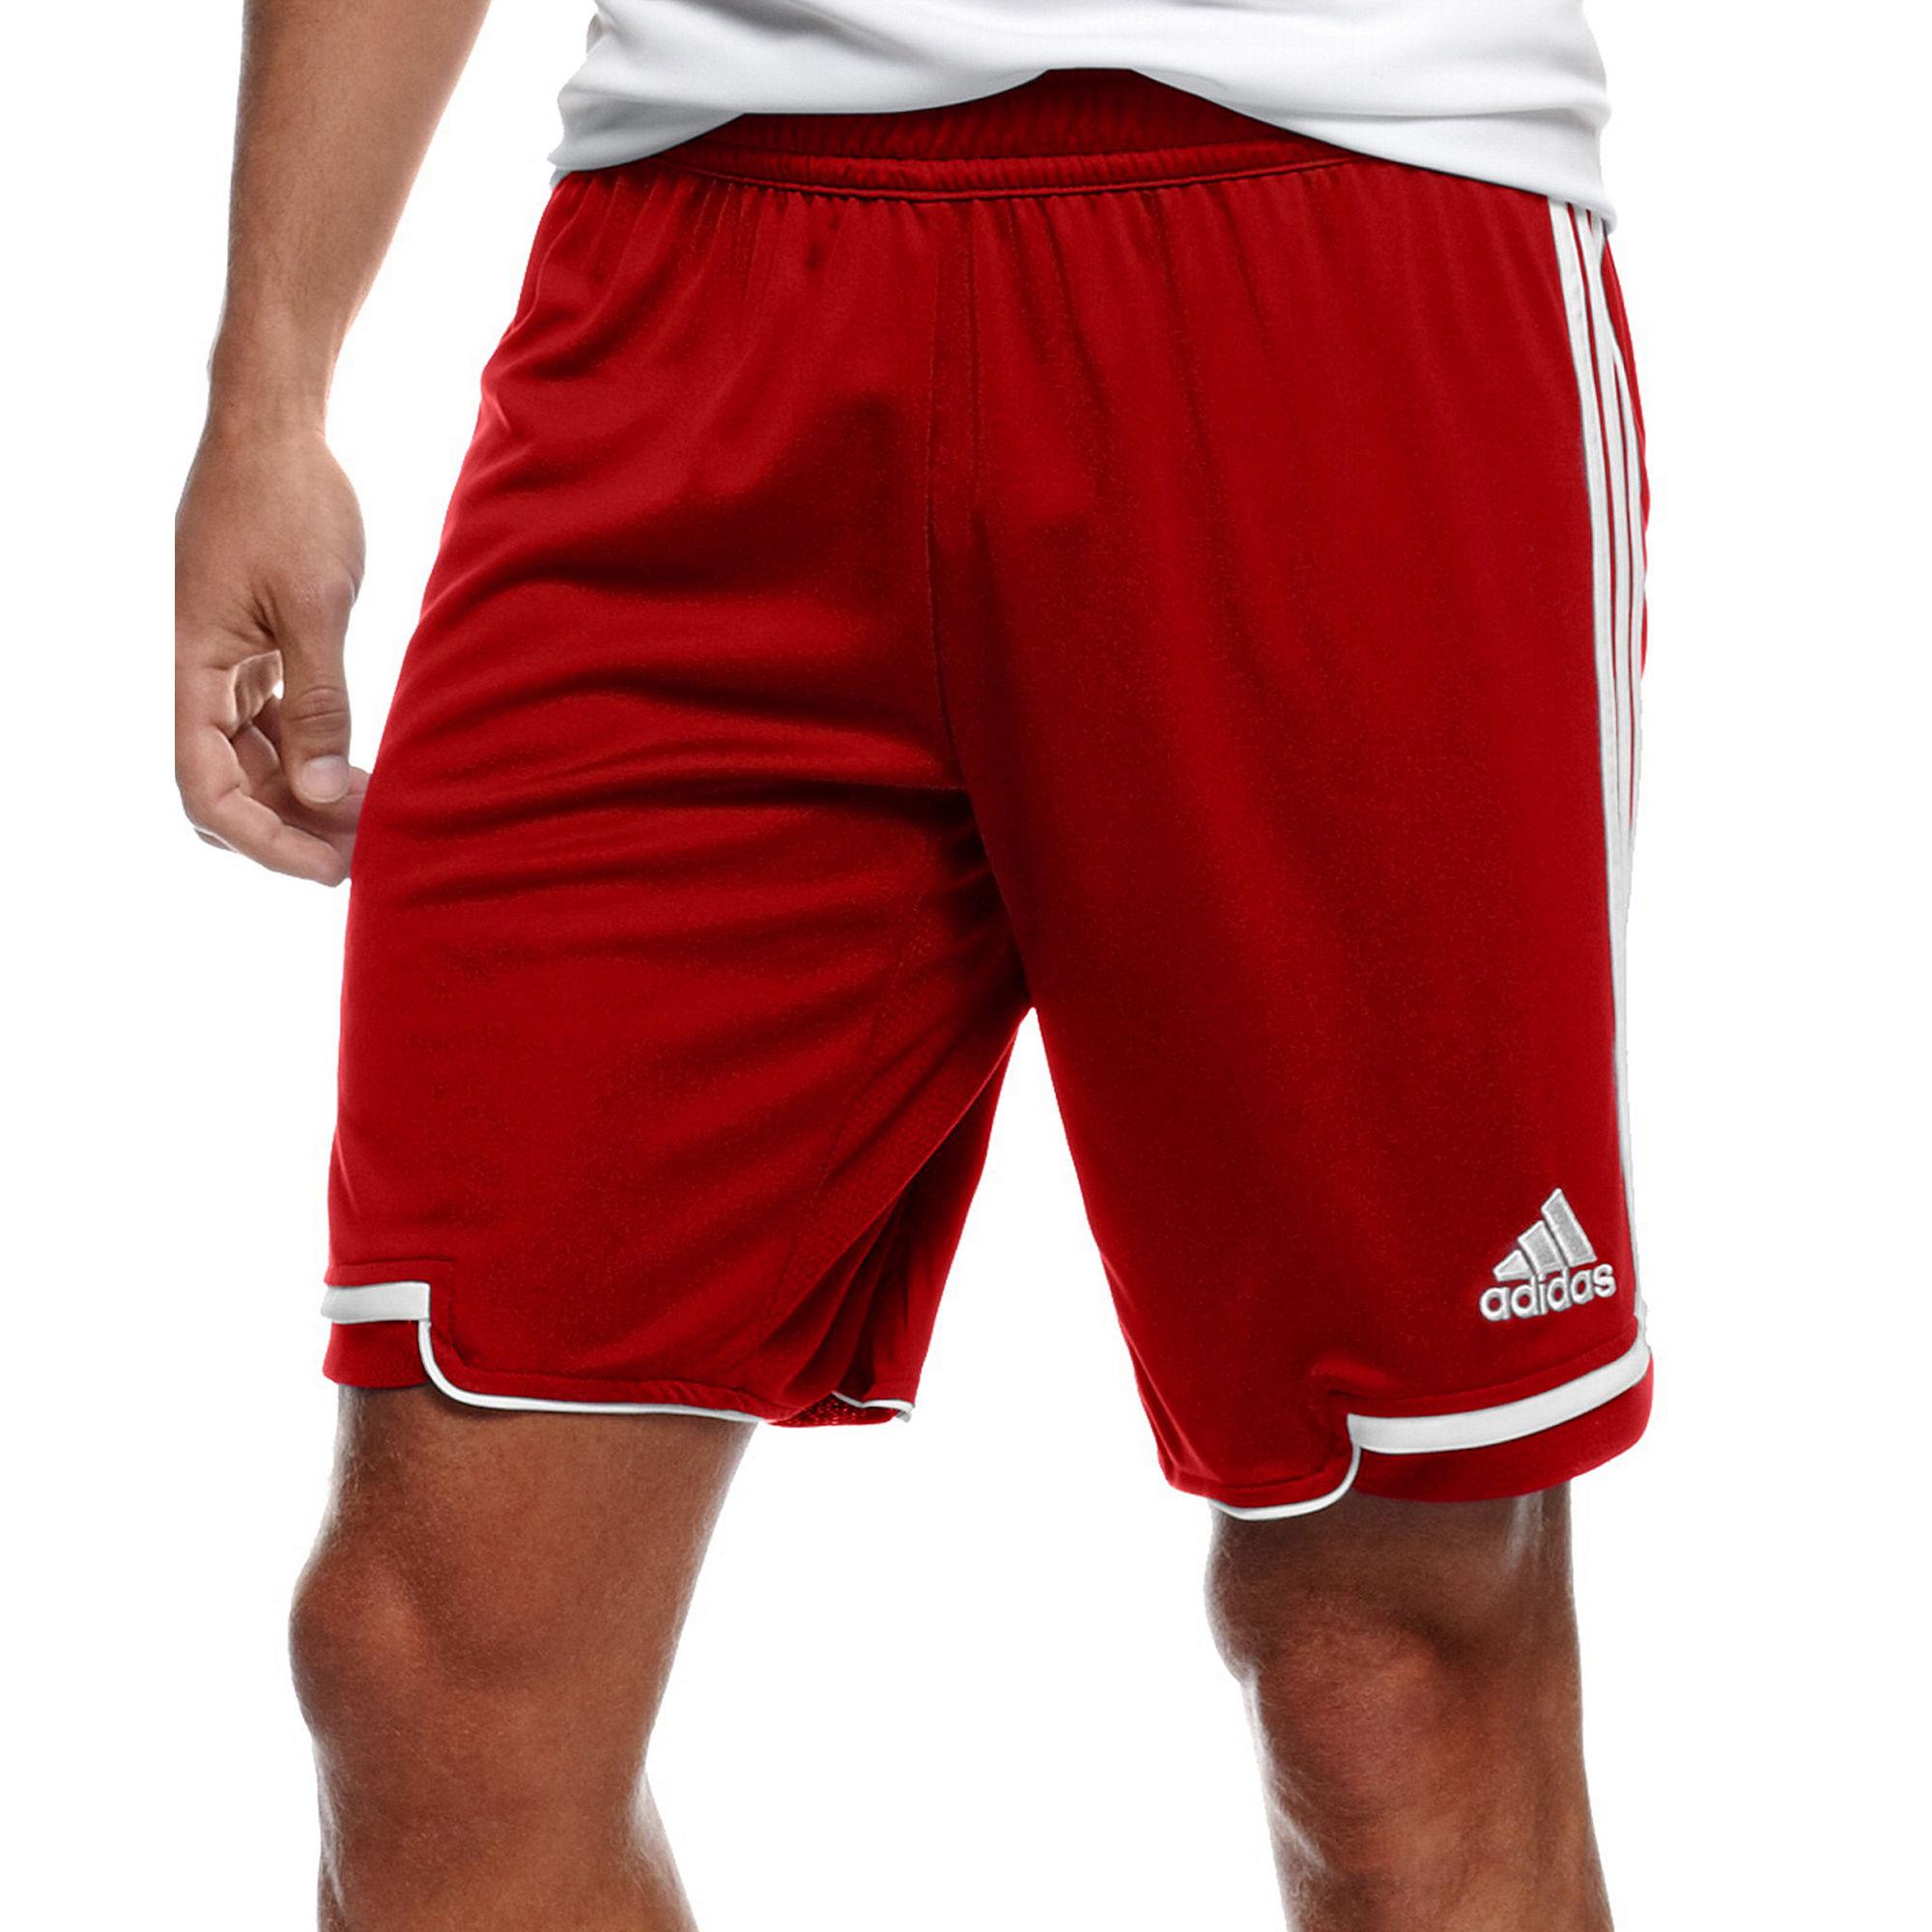 Lyst - adidas Regista 12 Climacool Soccer Shorts in Red for Men 29e3a3d527af